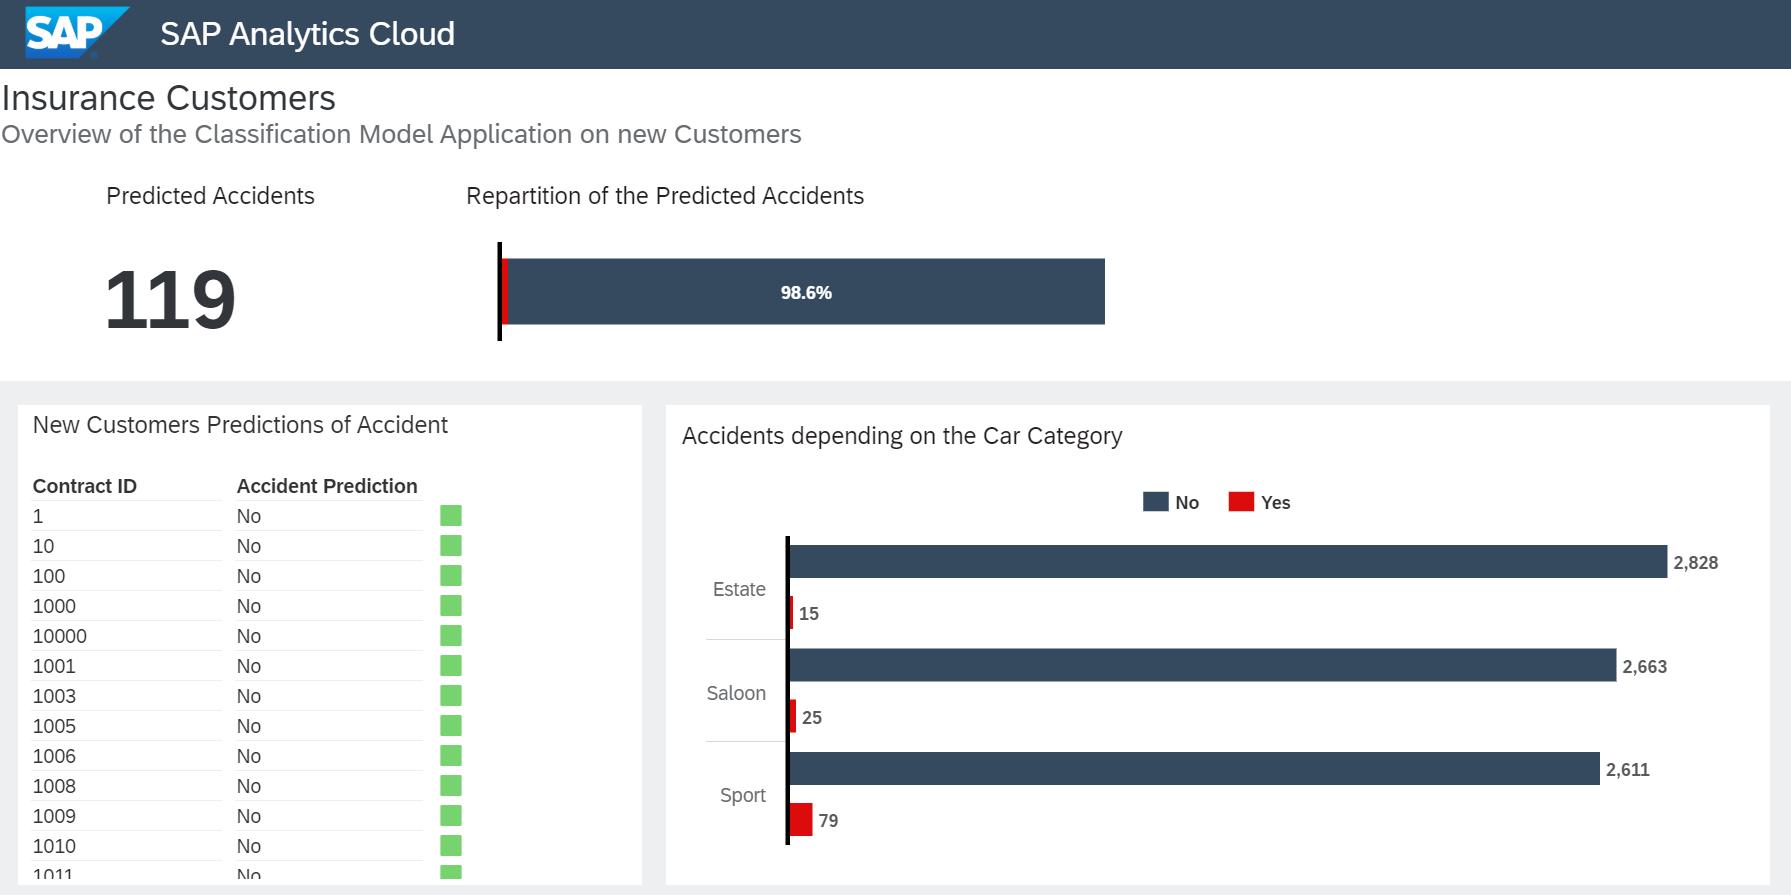 SAP%20Analytics%20Cloud%20Dashboard%20%282%29